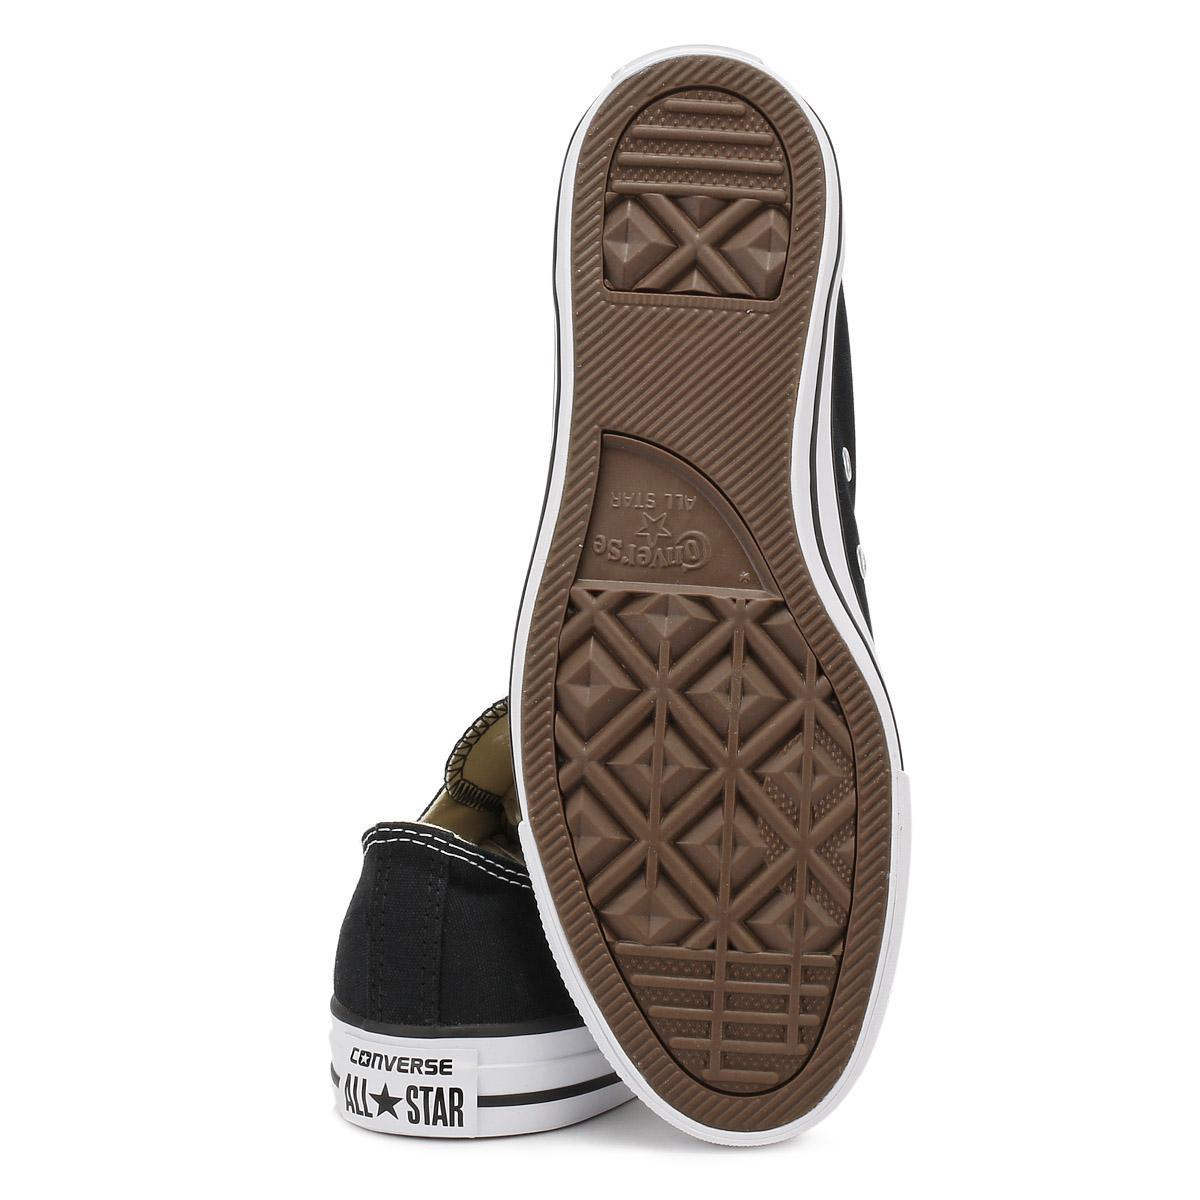 Converse Unisexe Noir All Chaussures Star Ox Baskets Hommes Femmes Toile Baskets Chaussures All 772c2a